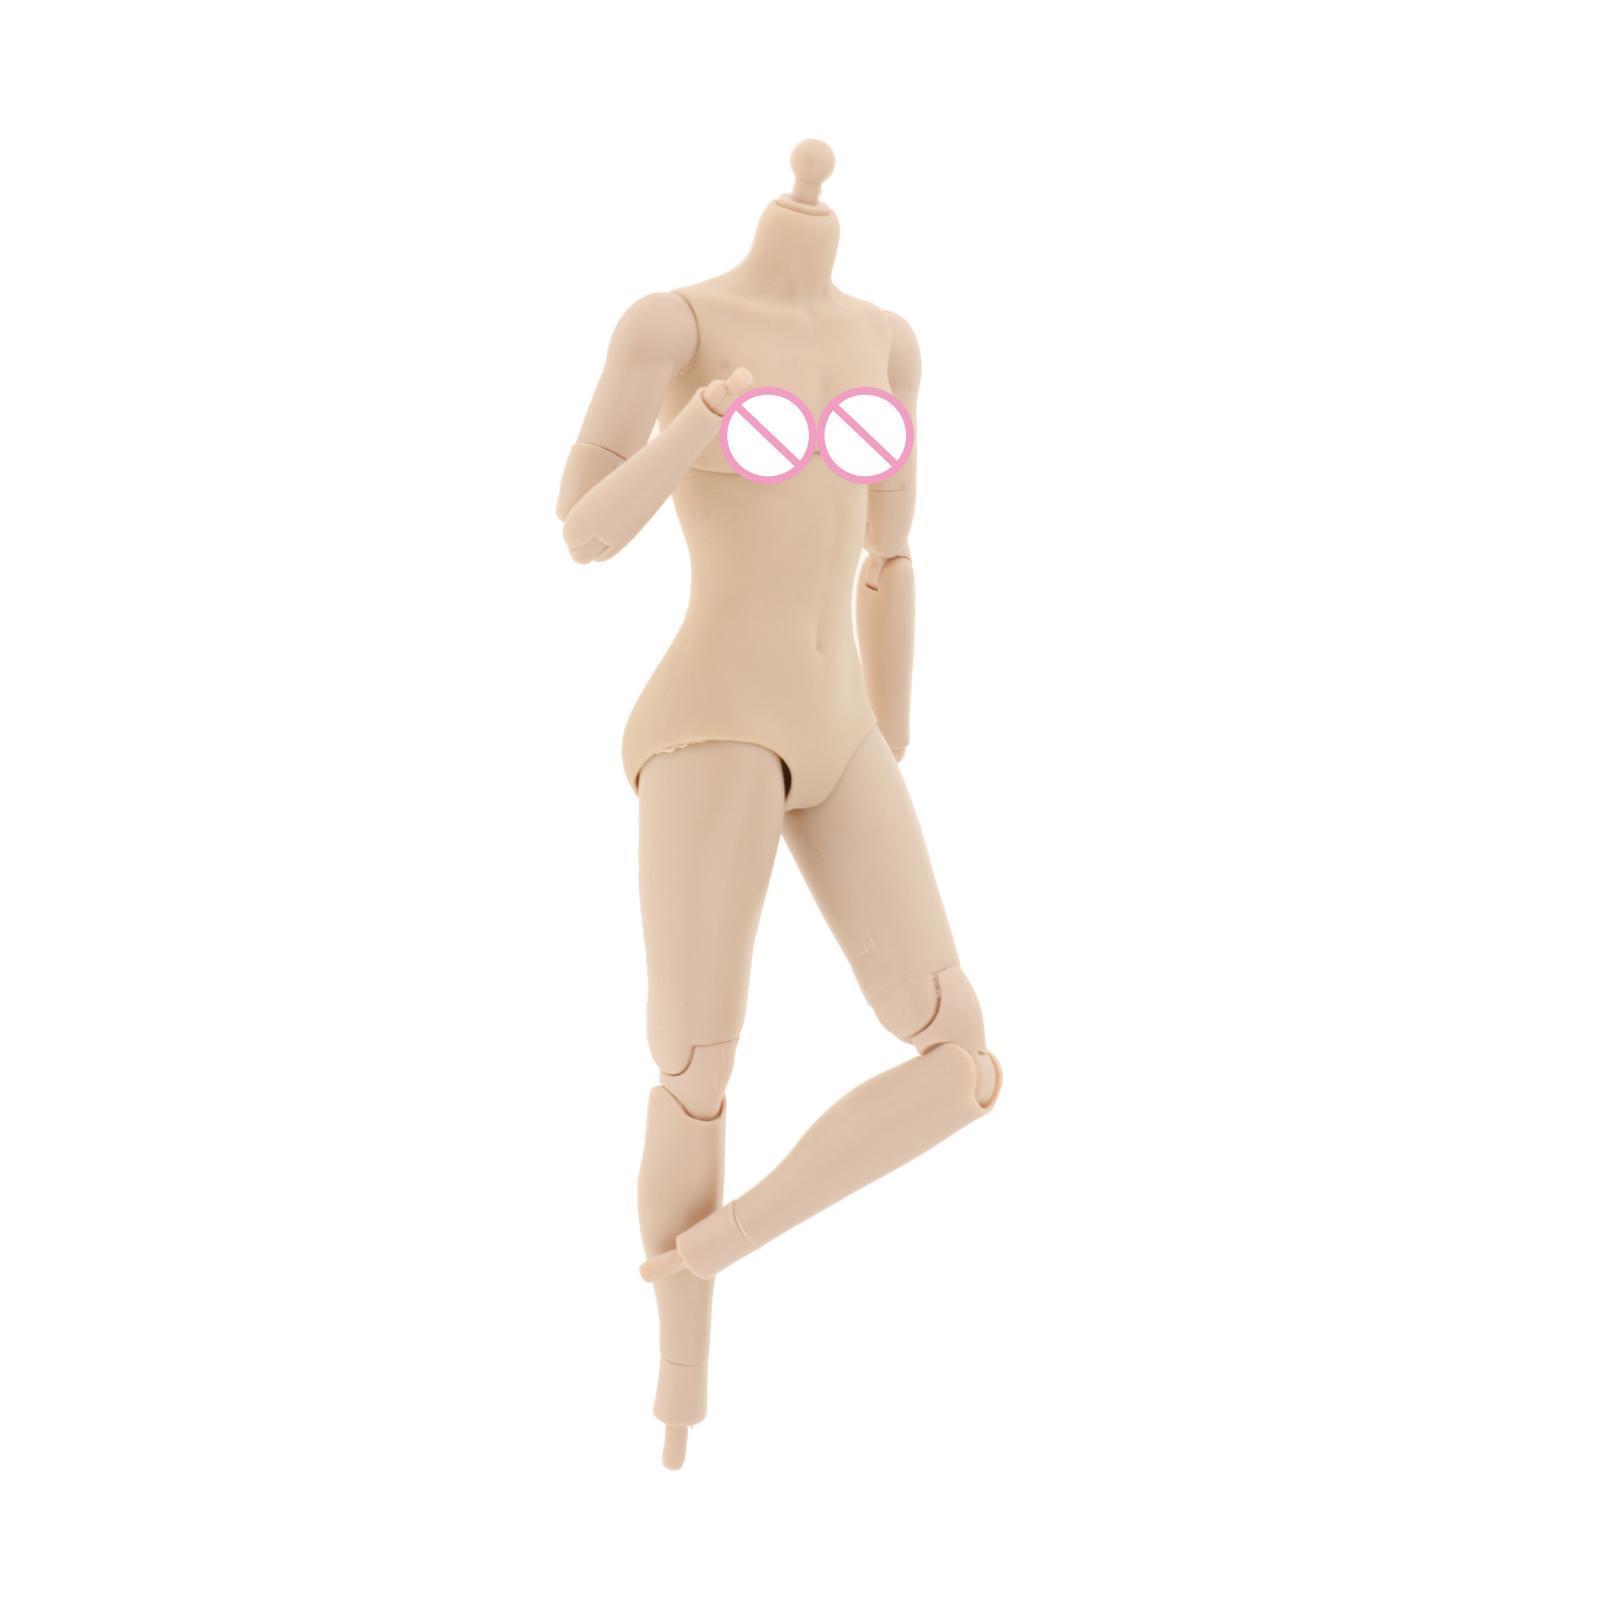 miniature 21 - 1/6 Scale Female Flexible Body 12 Inches Action Figure Body Seamless Figure